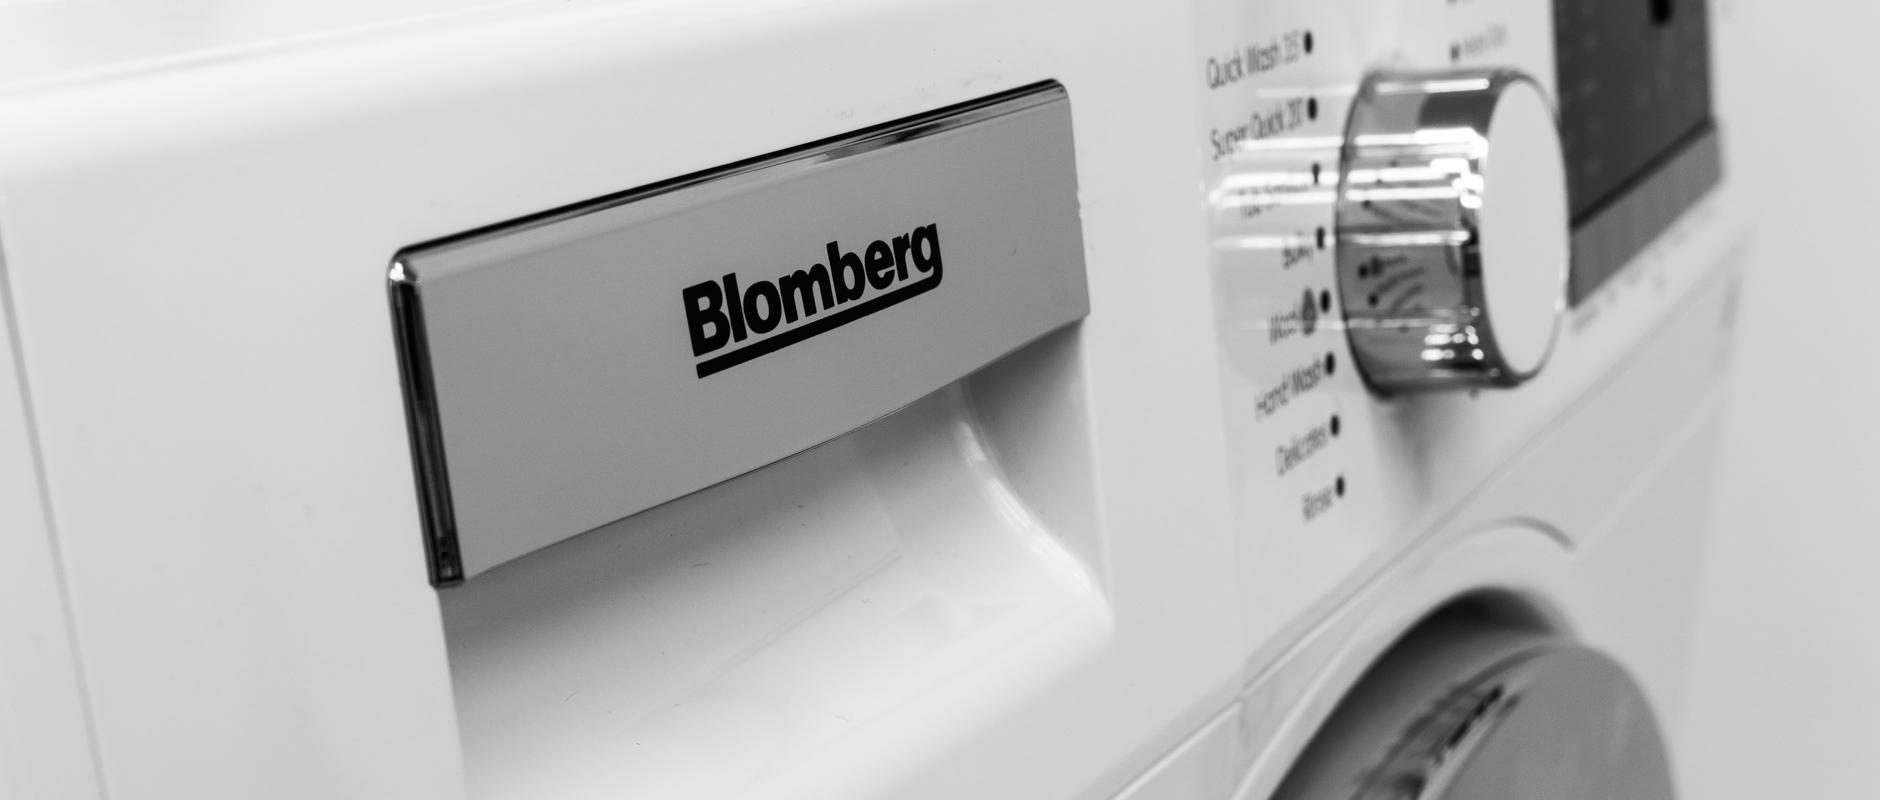 washing machine 24 inch